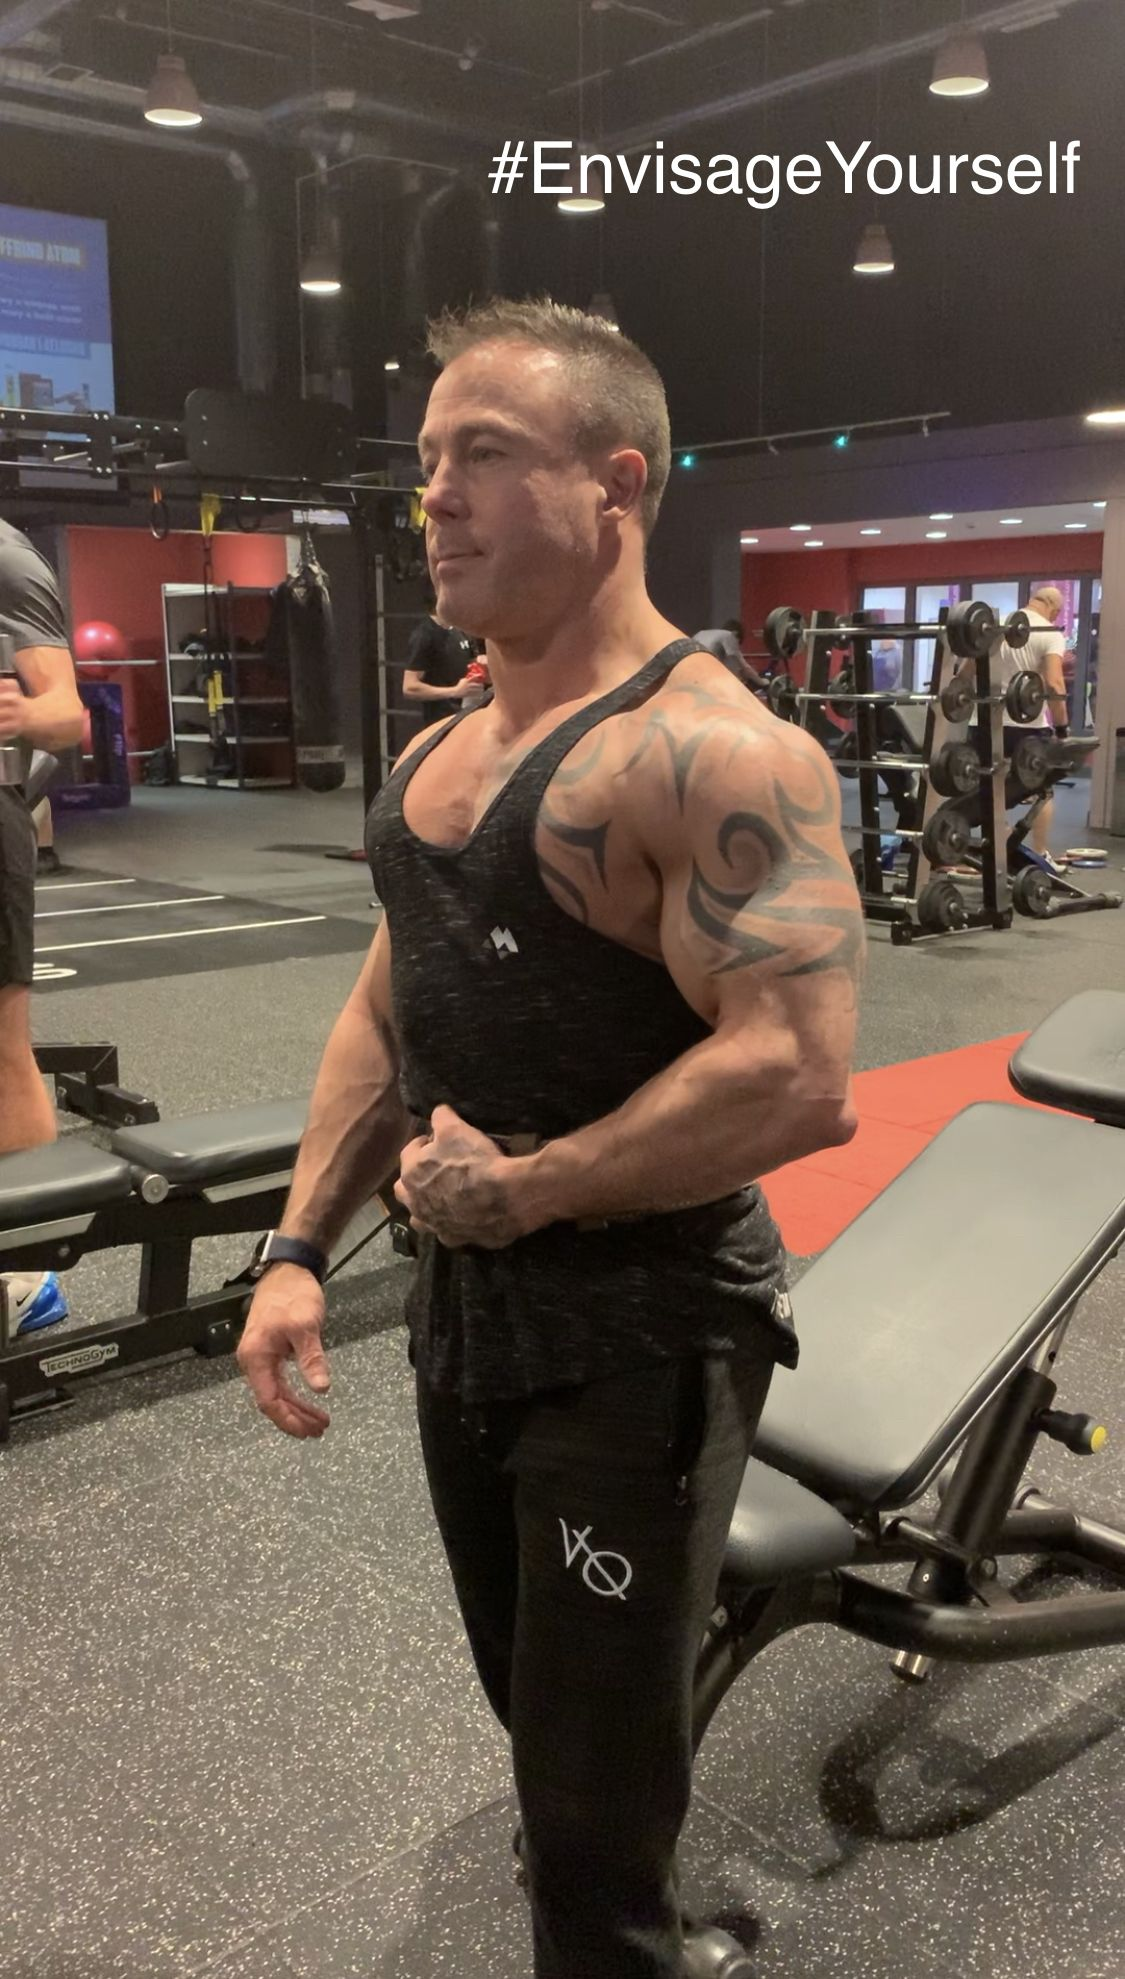 @fitnessmodelneil